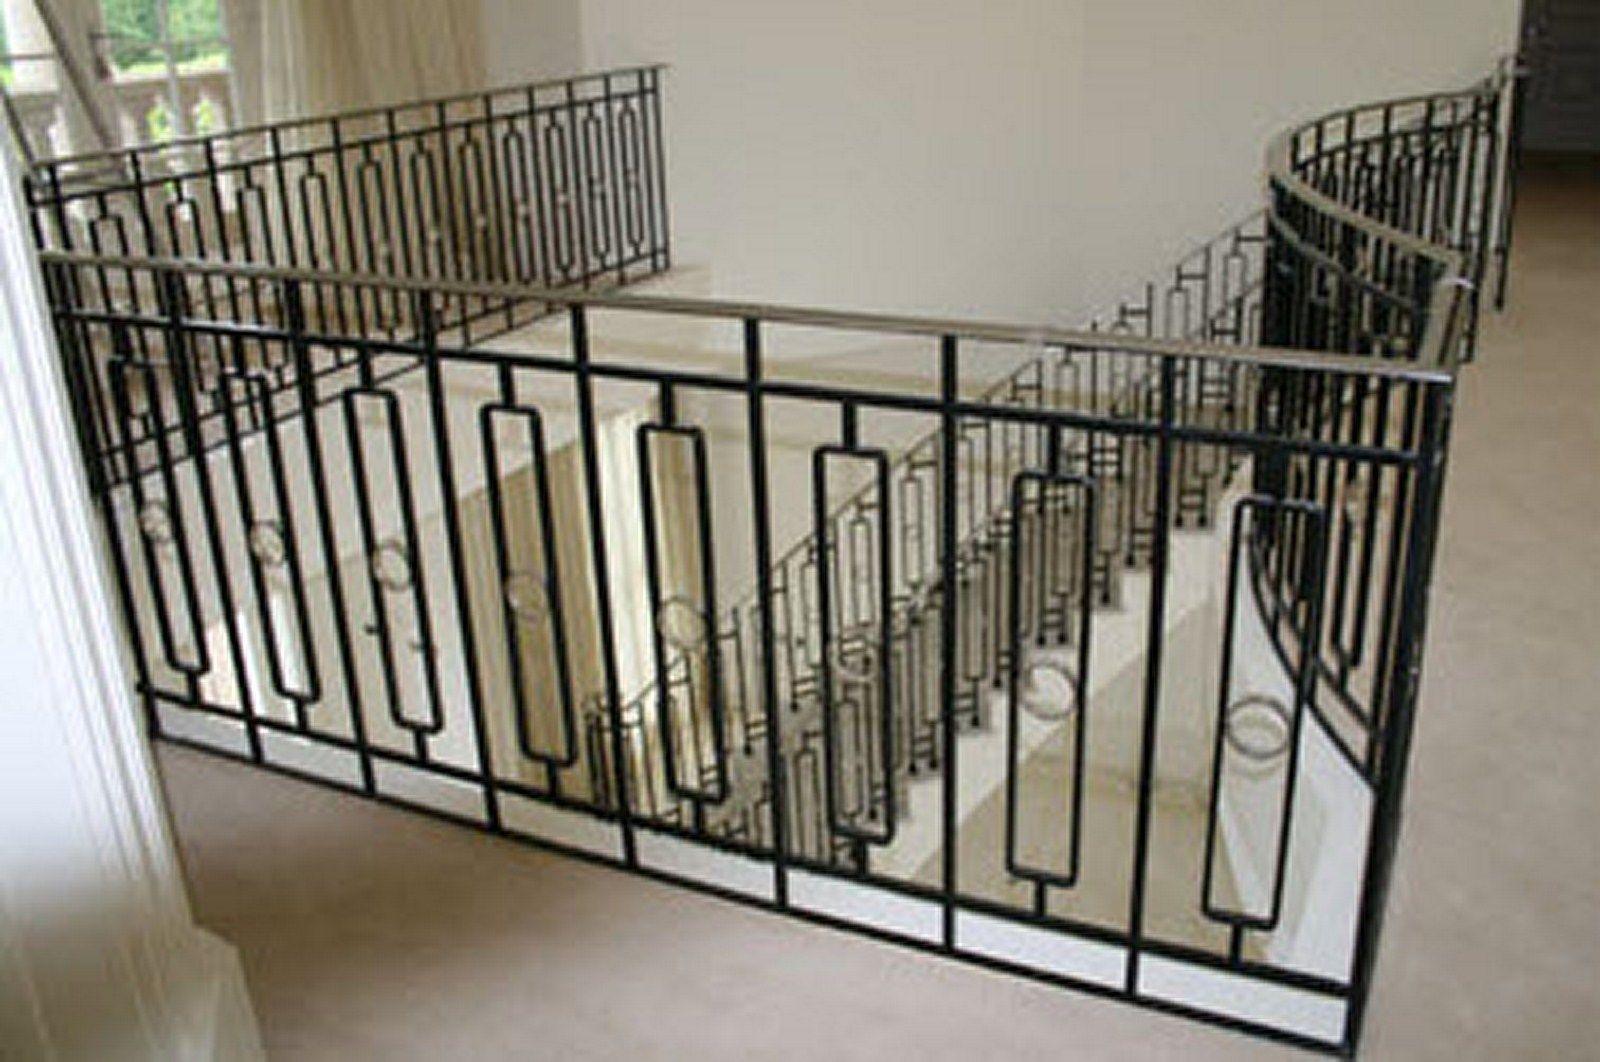 garde corps pinterest garde corps rambarde escalier et rampe escalier. Black Bedroom Furniture Sets. Home Design Ideas